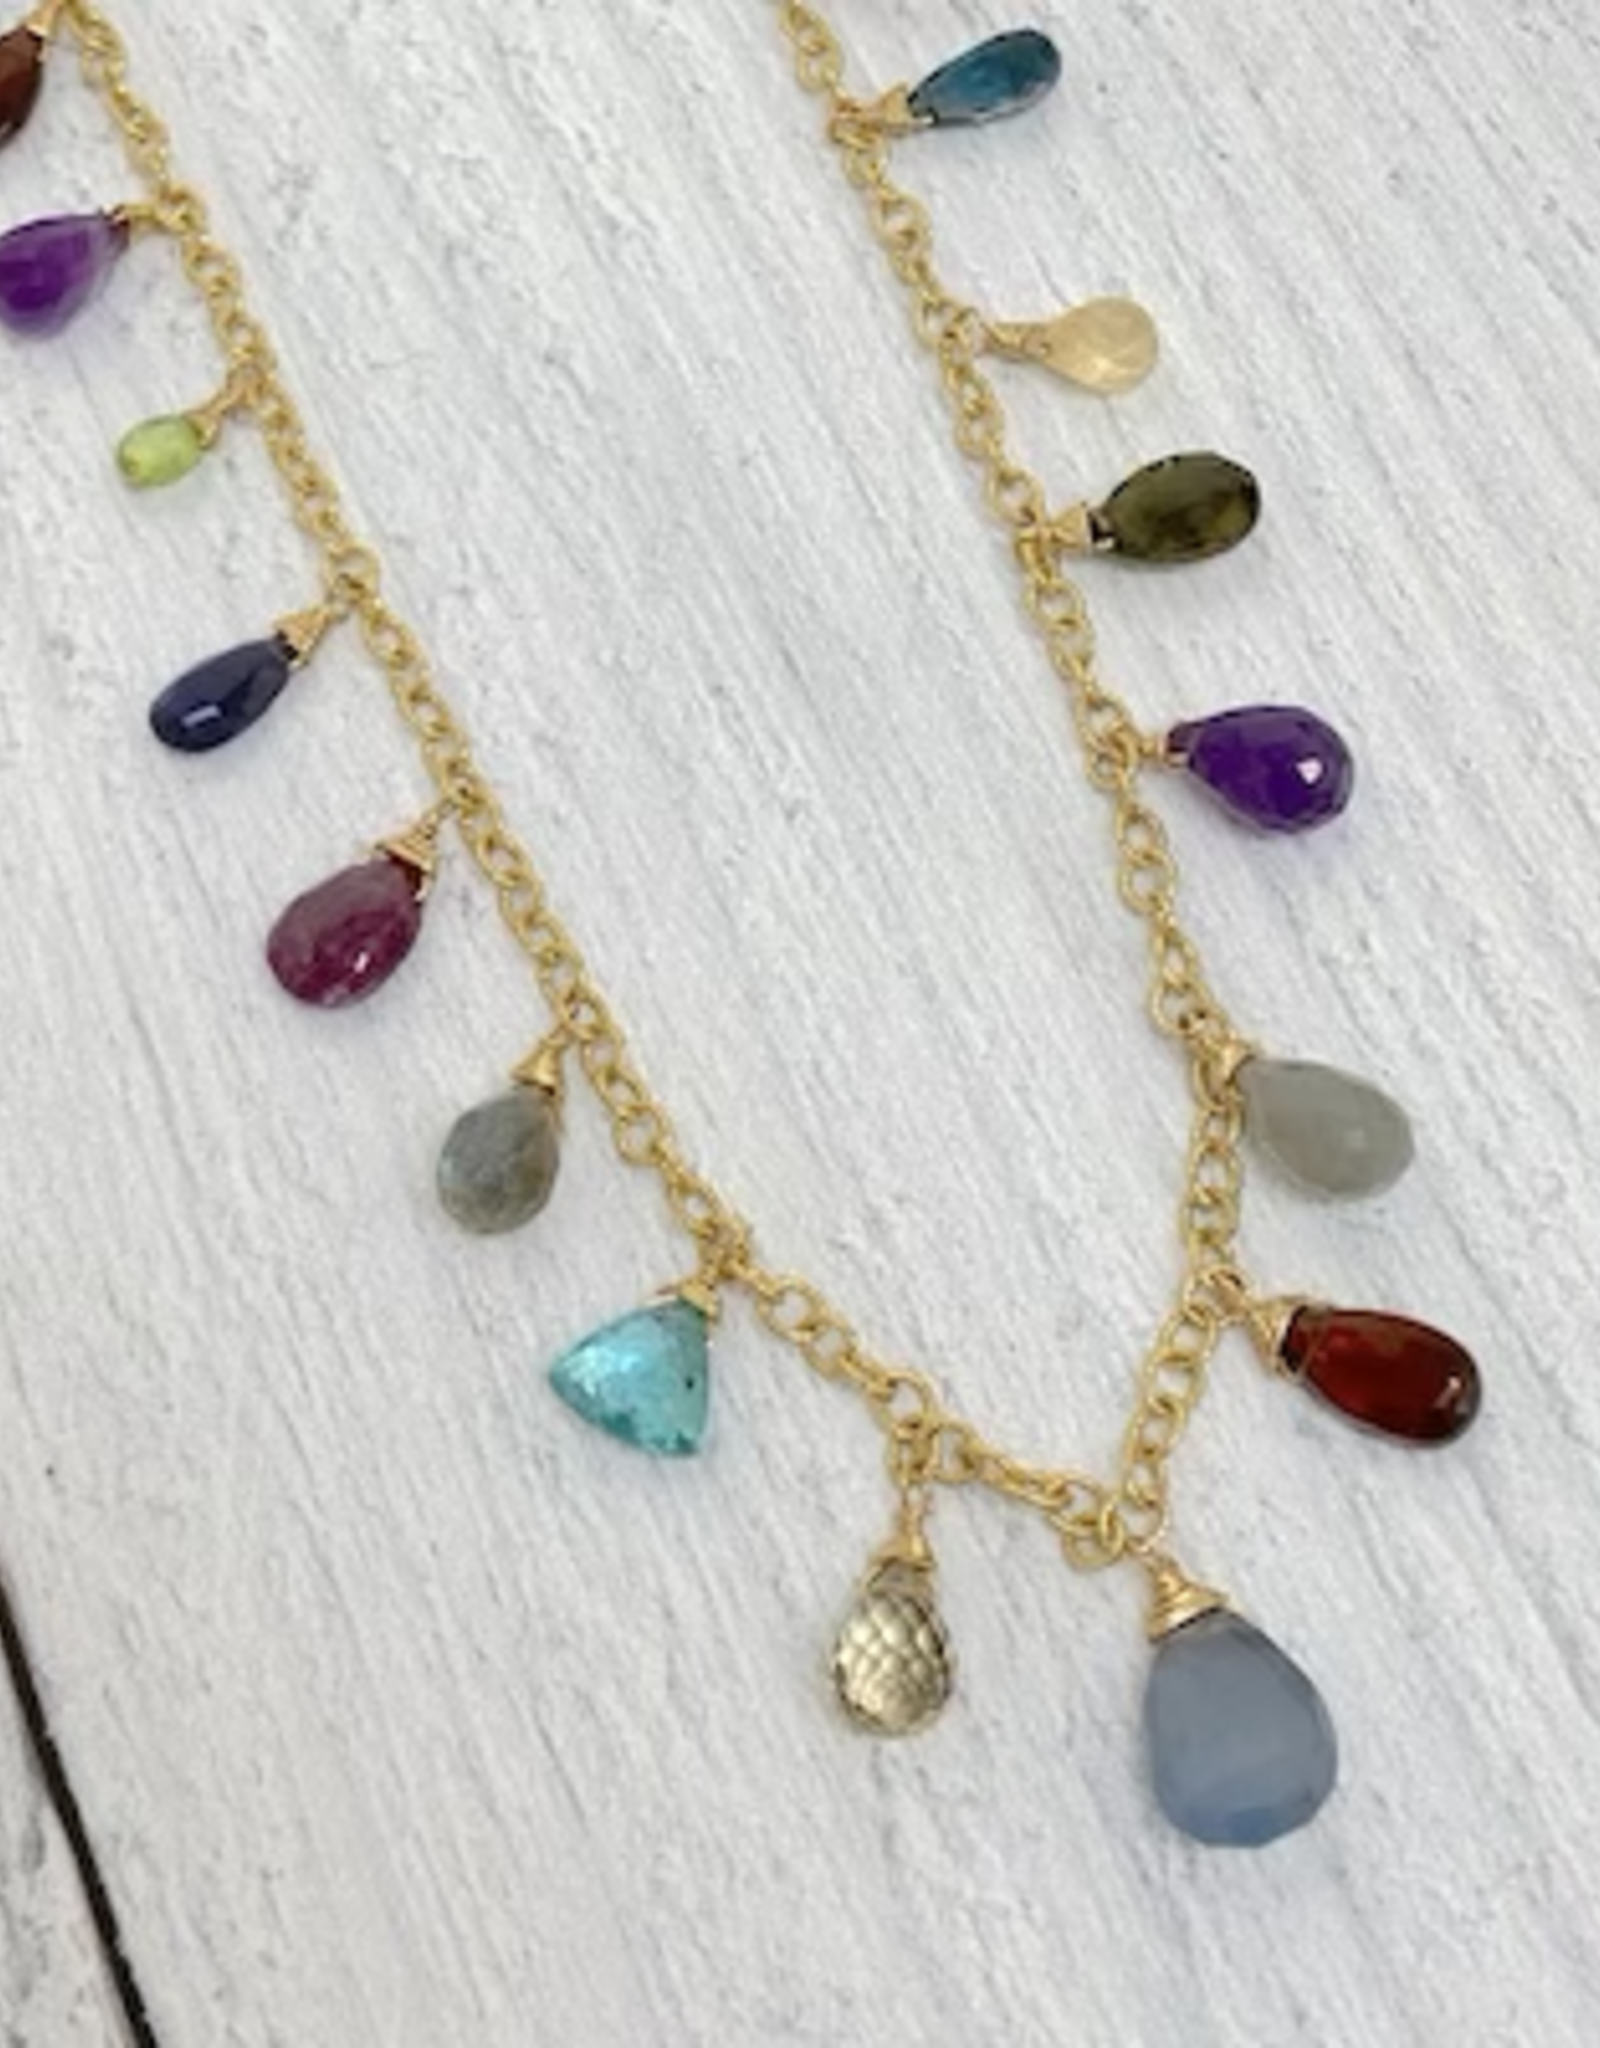 Handmade 14k Goldfill Chain Necklace with jewel tone briolettes: chalcedony, topaz, peridot, london blue topaz, ruby, garnet, citrine, apatite, tourmaline, moss aquamarine, iolite, amethyst